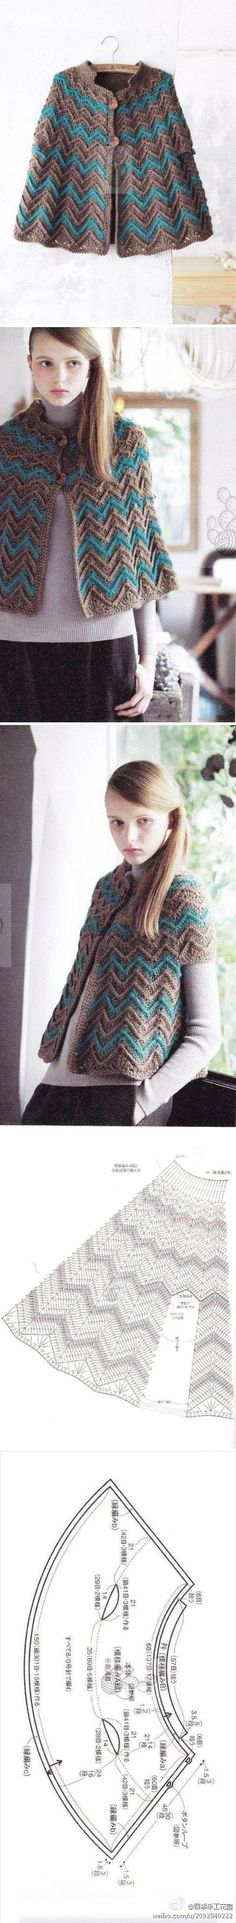 Crochet Convertible Cape